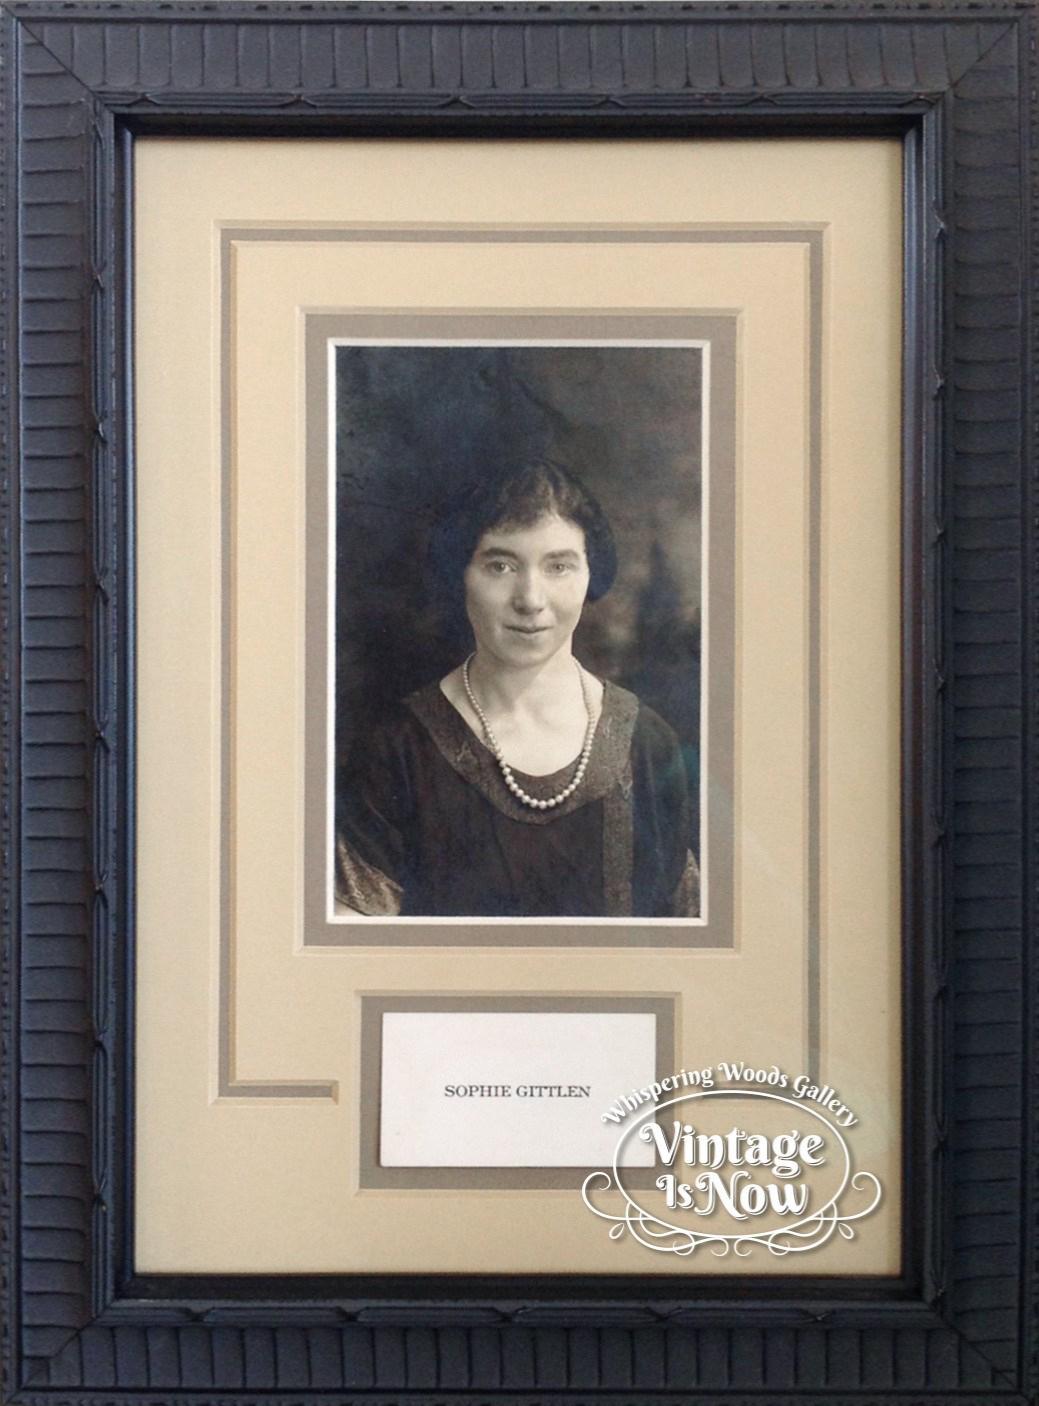 Custom framed photo and calling card